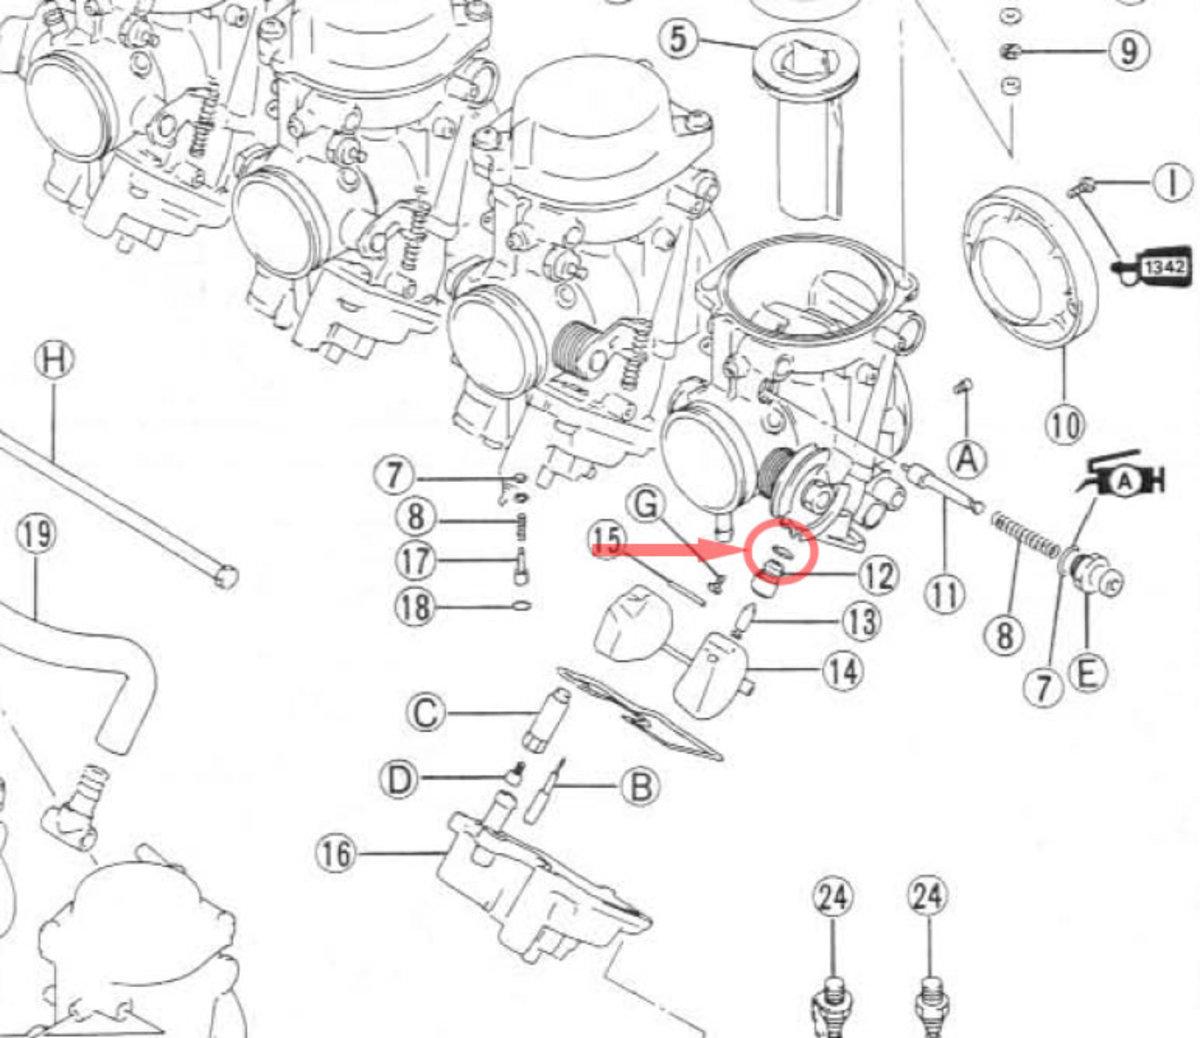 1988 honda shadow engine diagram